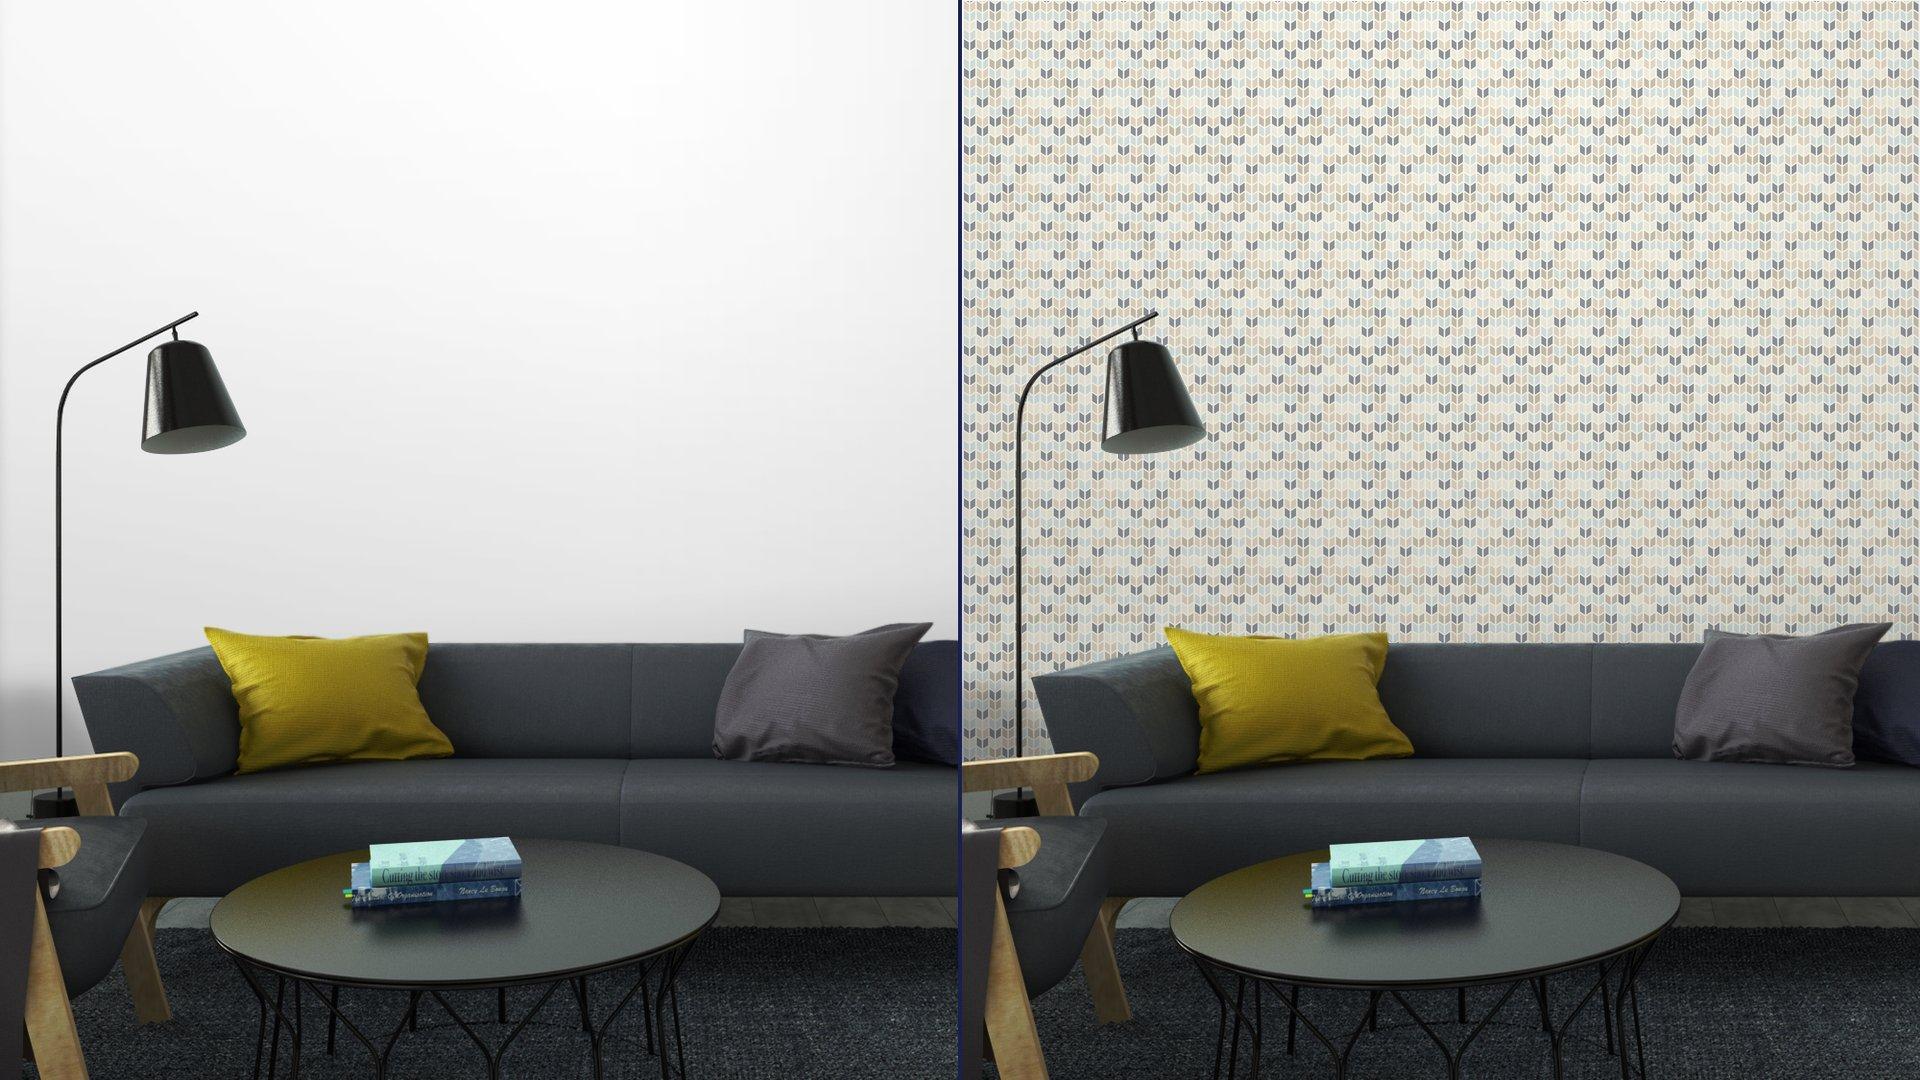 Fotomurales mexico papeles pintados lavables seamless patron geometrico en tonos pastel 5 - Papel Tapiz Patrón Geométrico Tonos Pastel 01